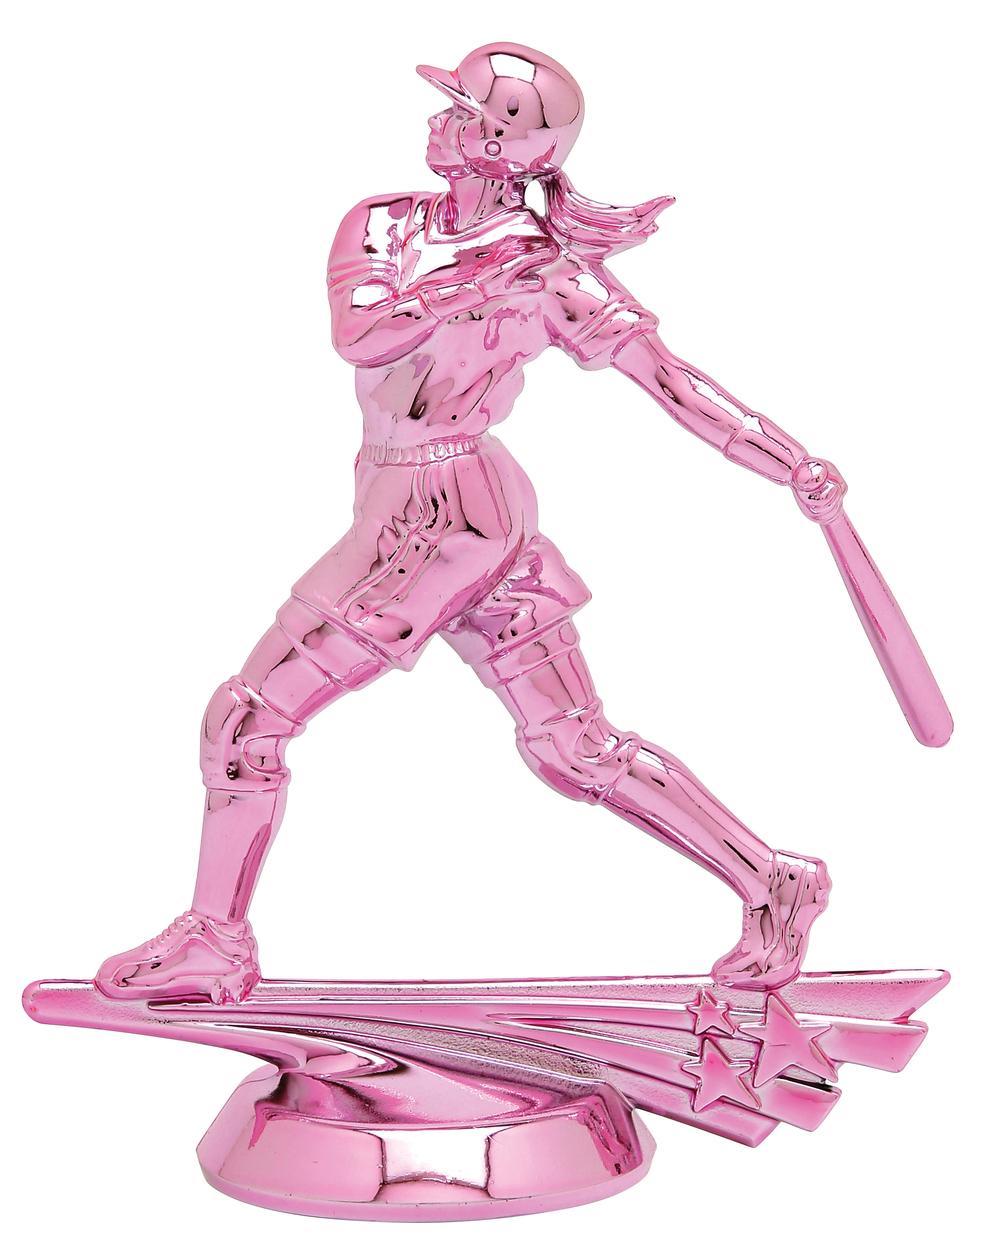 "Pink All Star Softball 6520-H - 5"" tall"